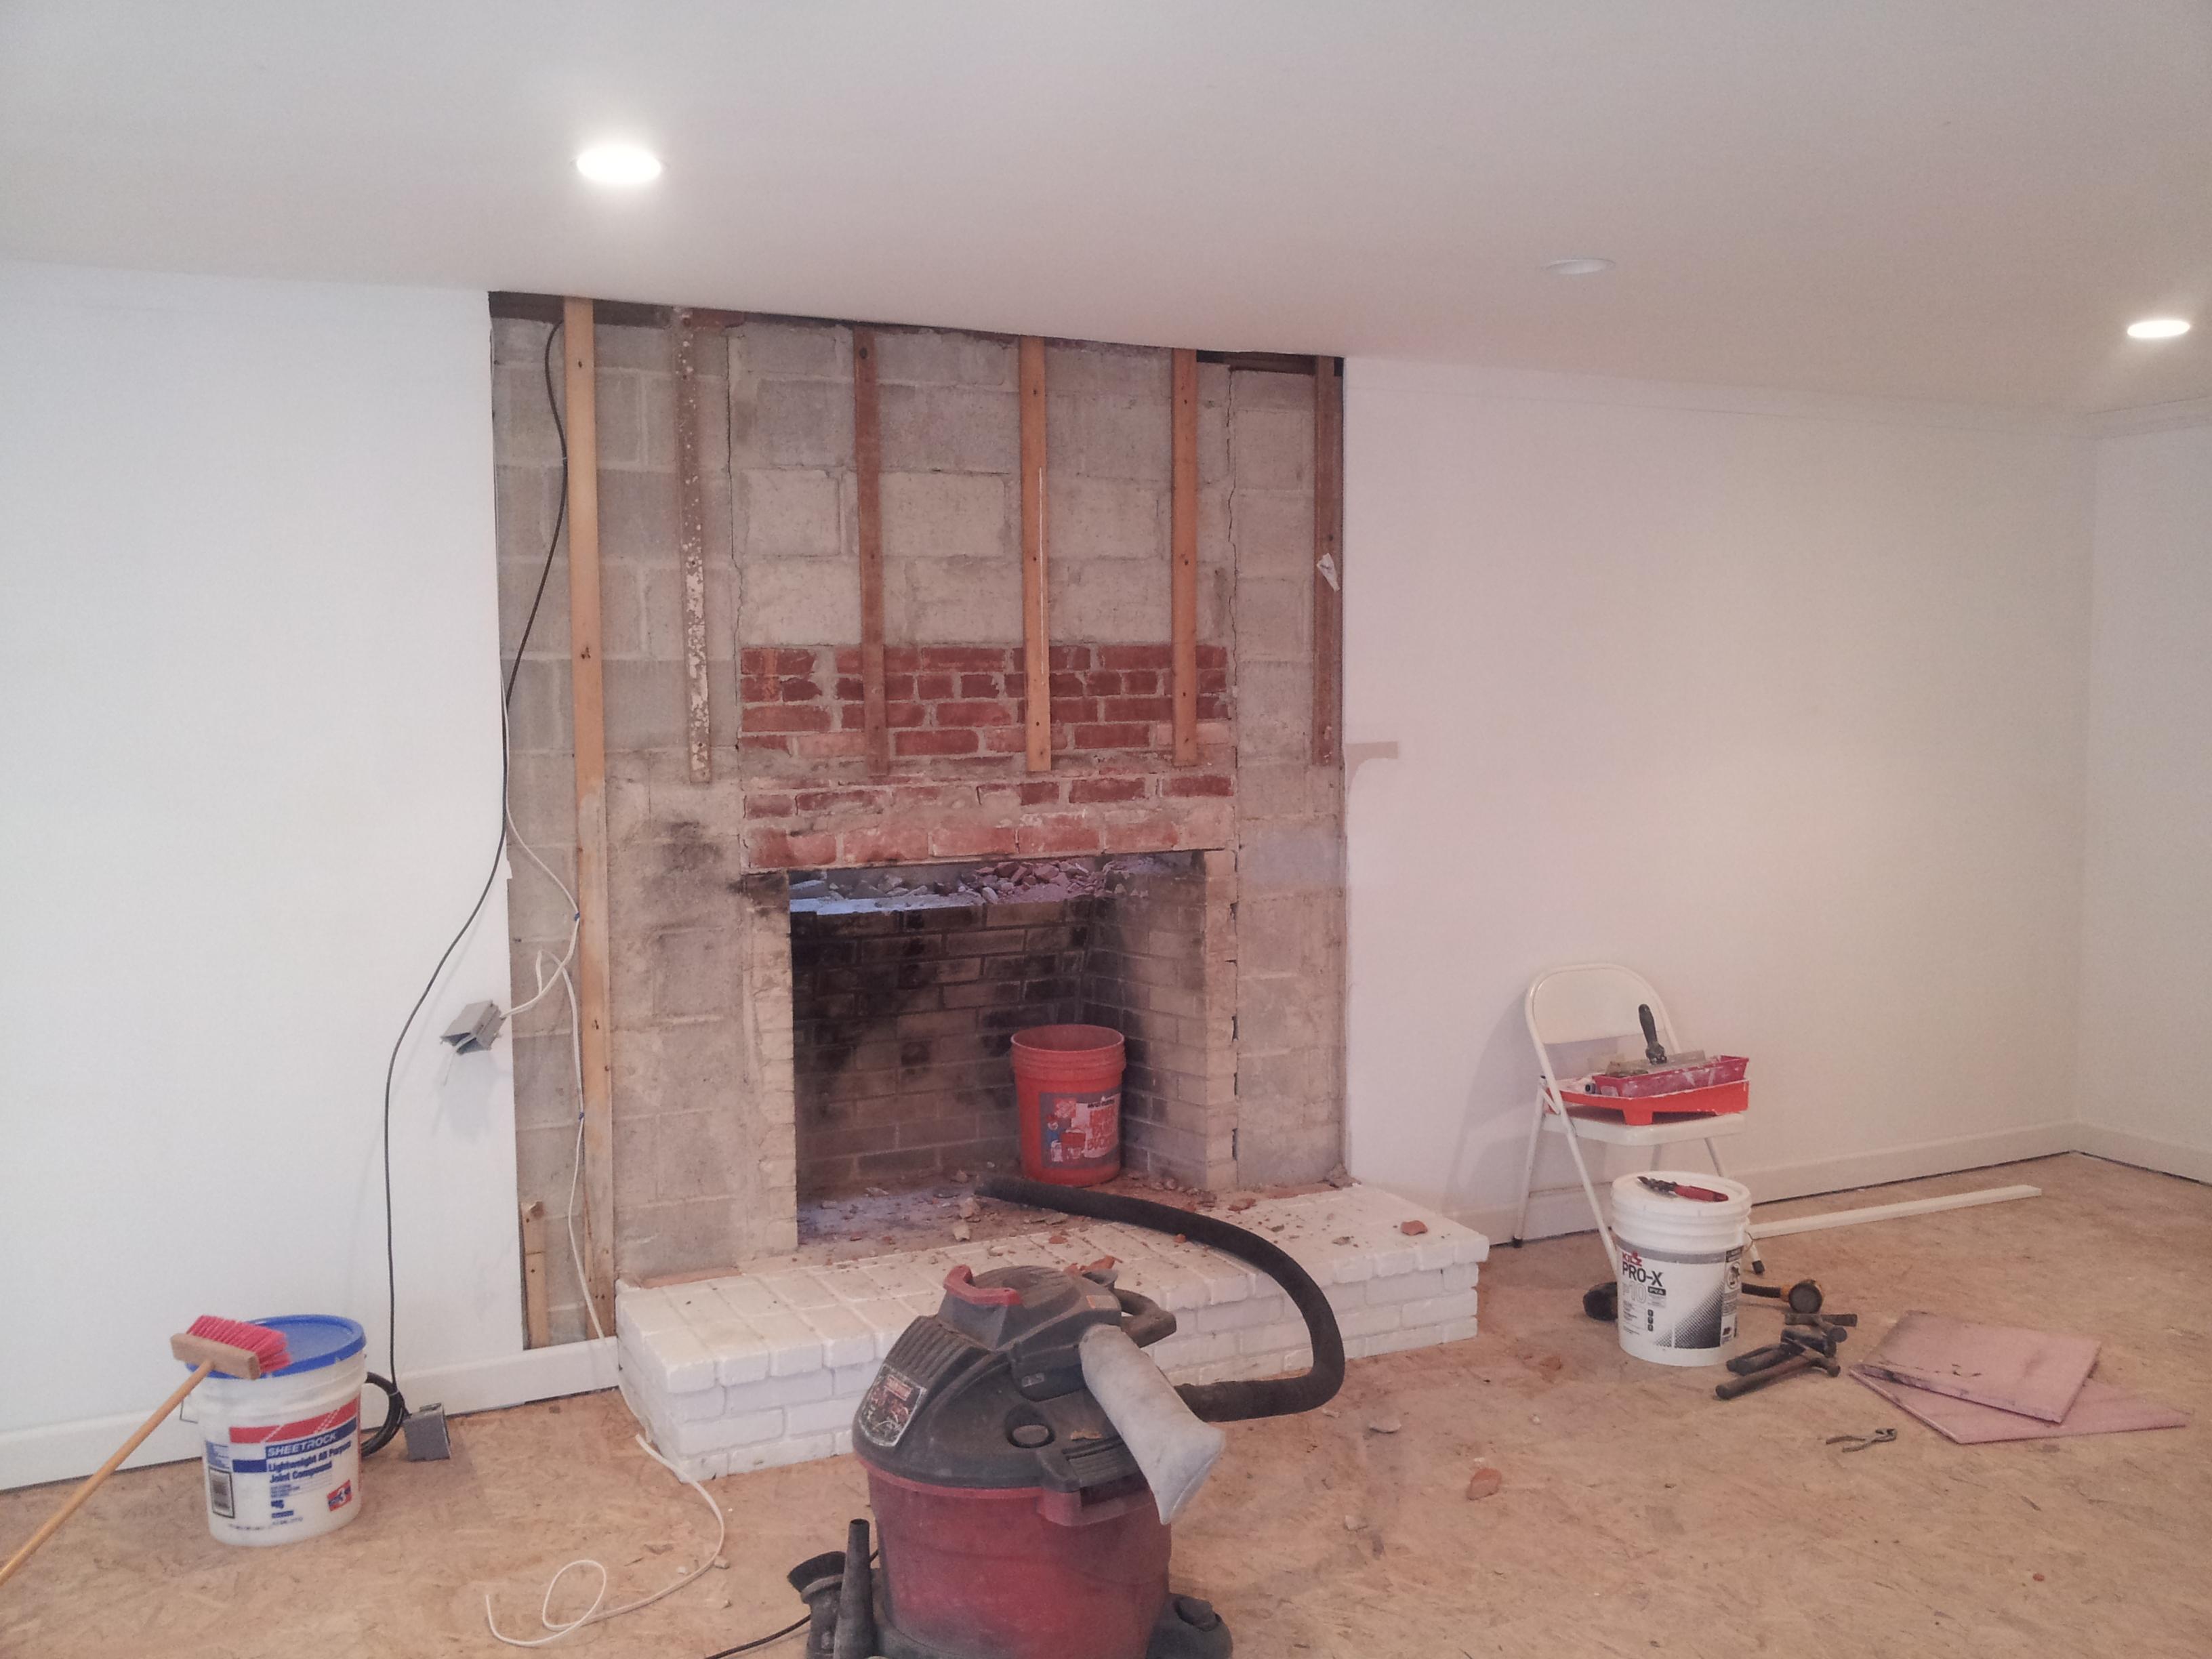 Chimney Construction & Repair | Chimneys Plus Chimney Service ...